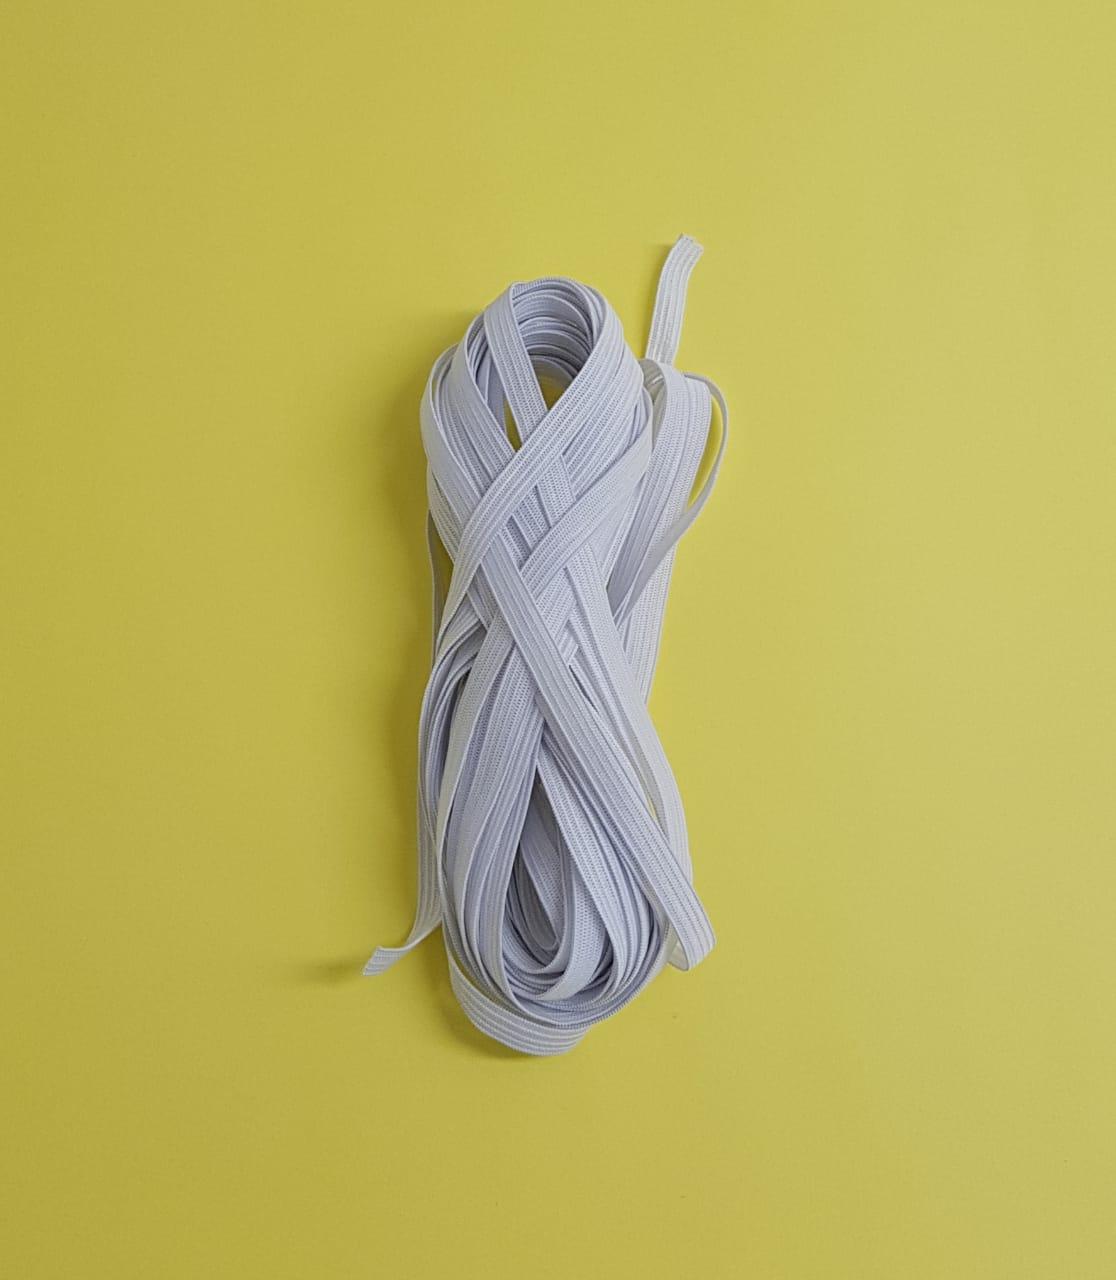 Elástico chato 7mm - branco - peça c/10 metros (cód: 1109)